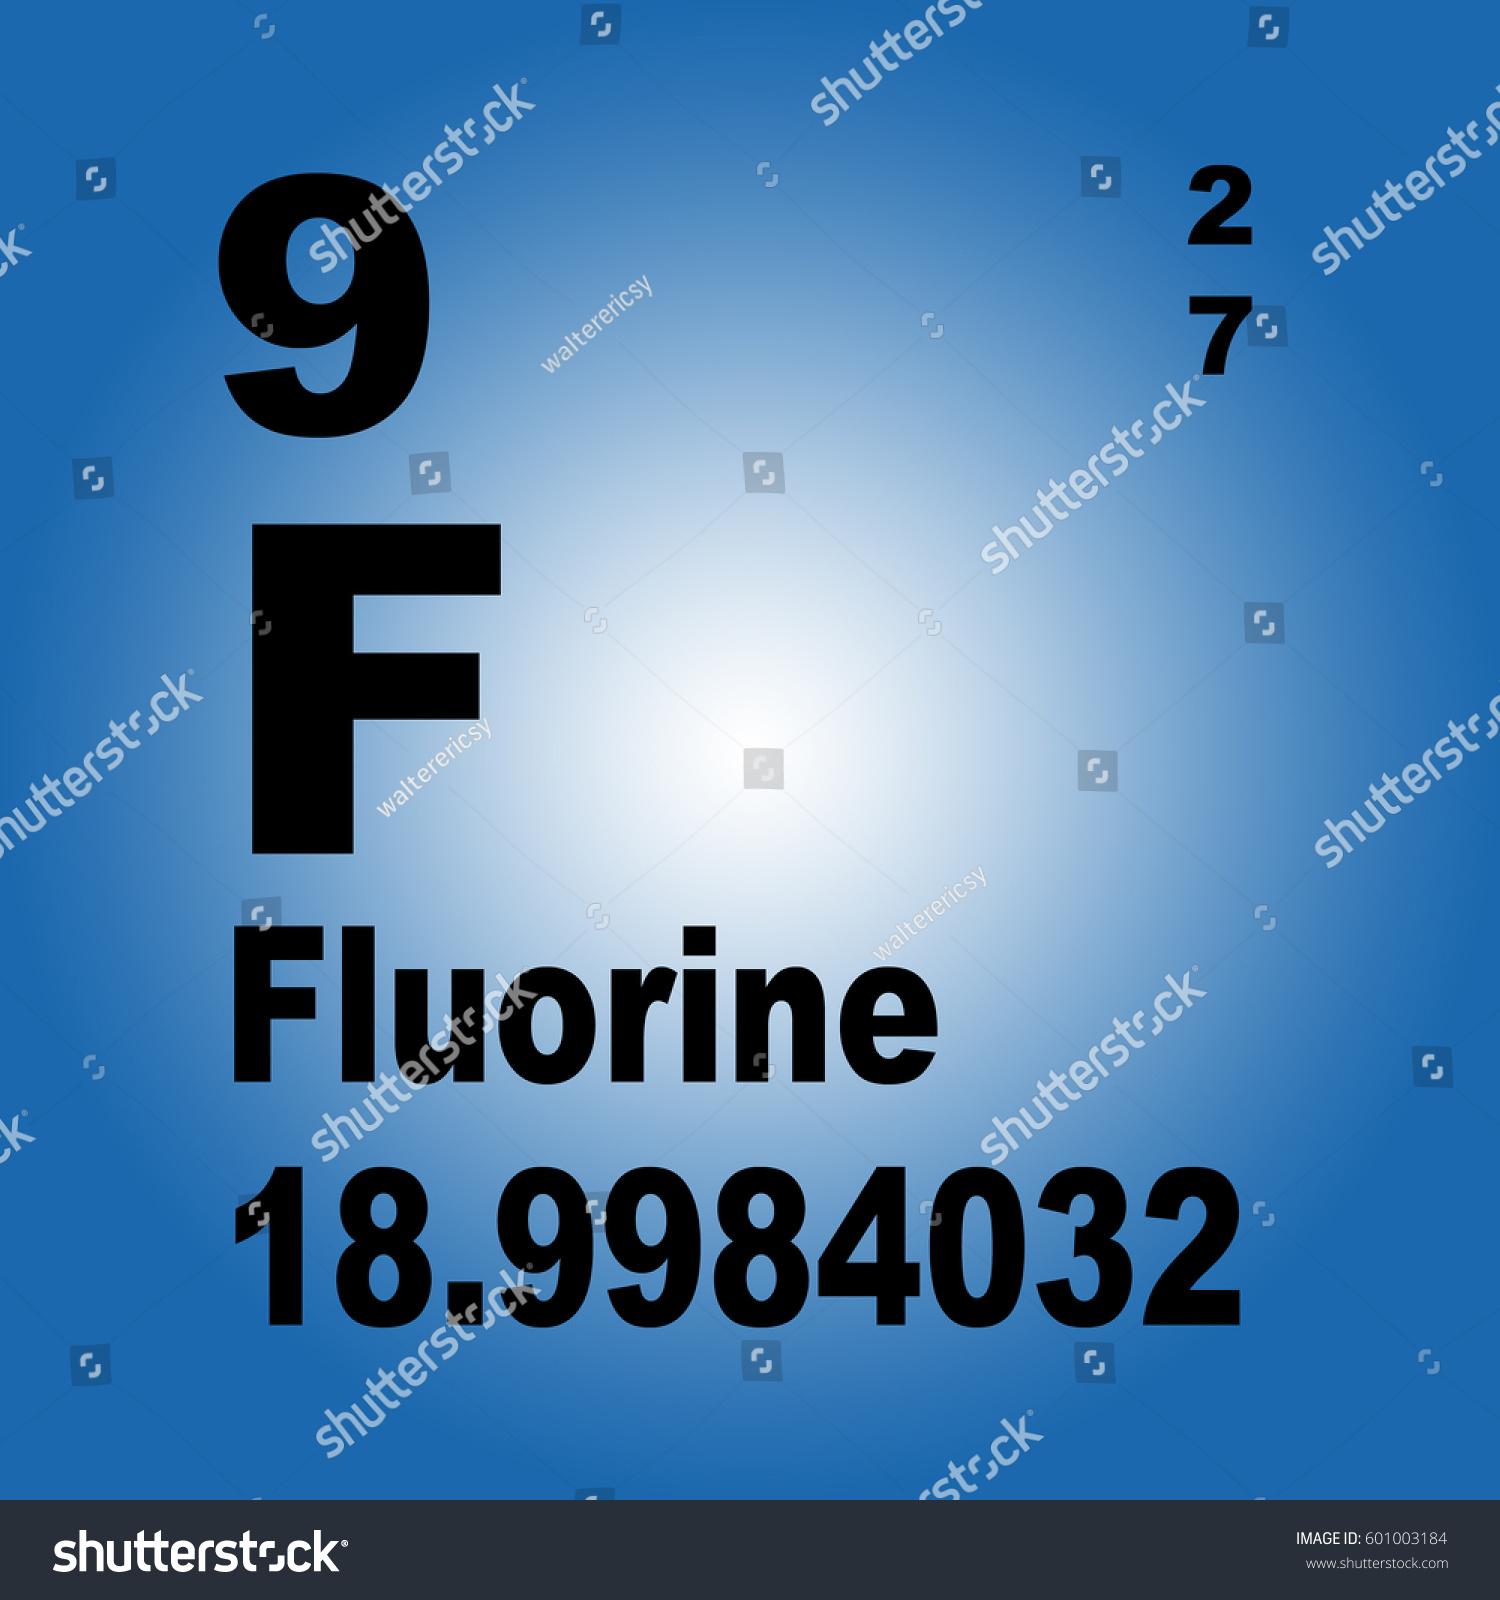 Fluorine periodic table elements stock illustration 601003184 fluorine periodic table of elements gamestrikefo Gallery